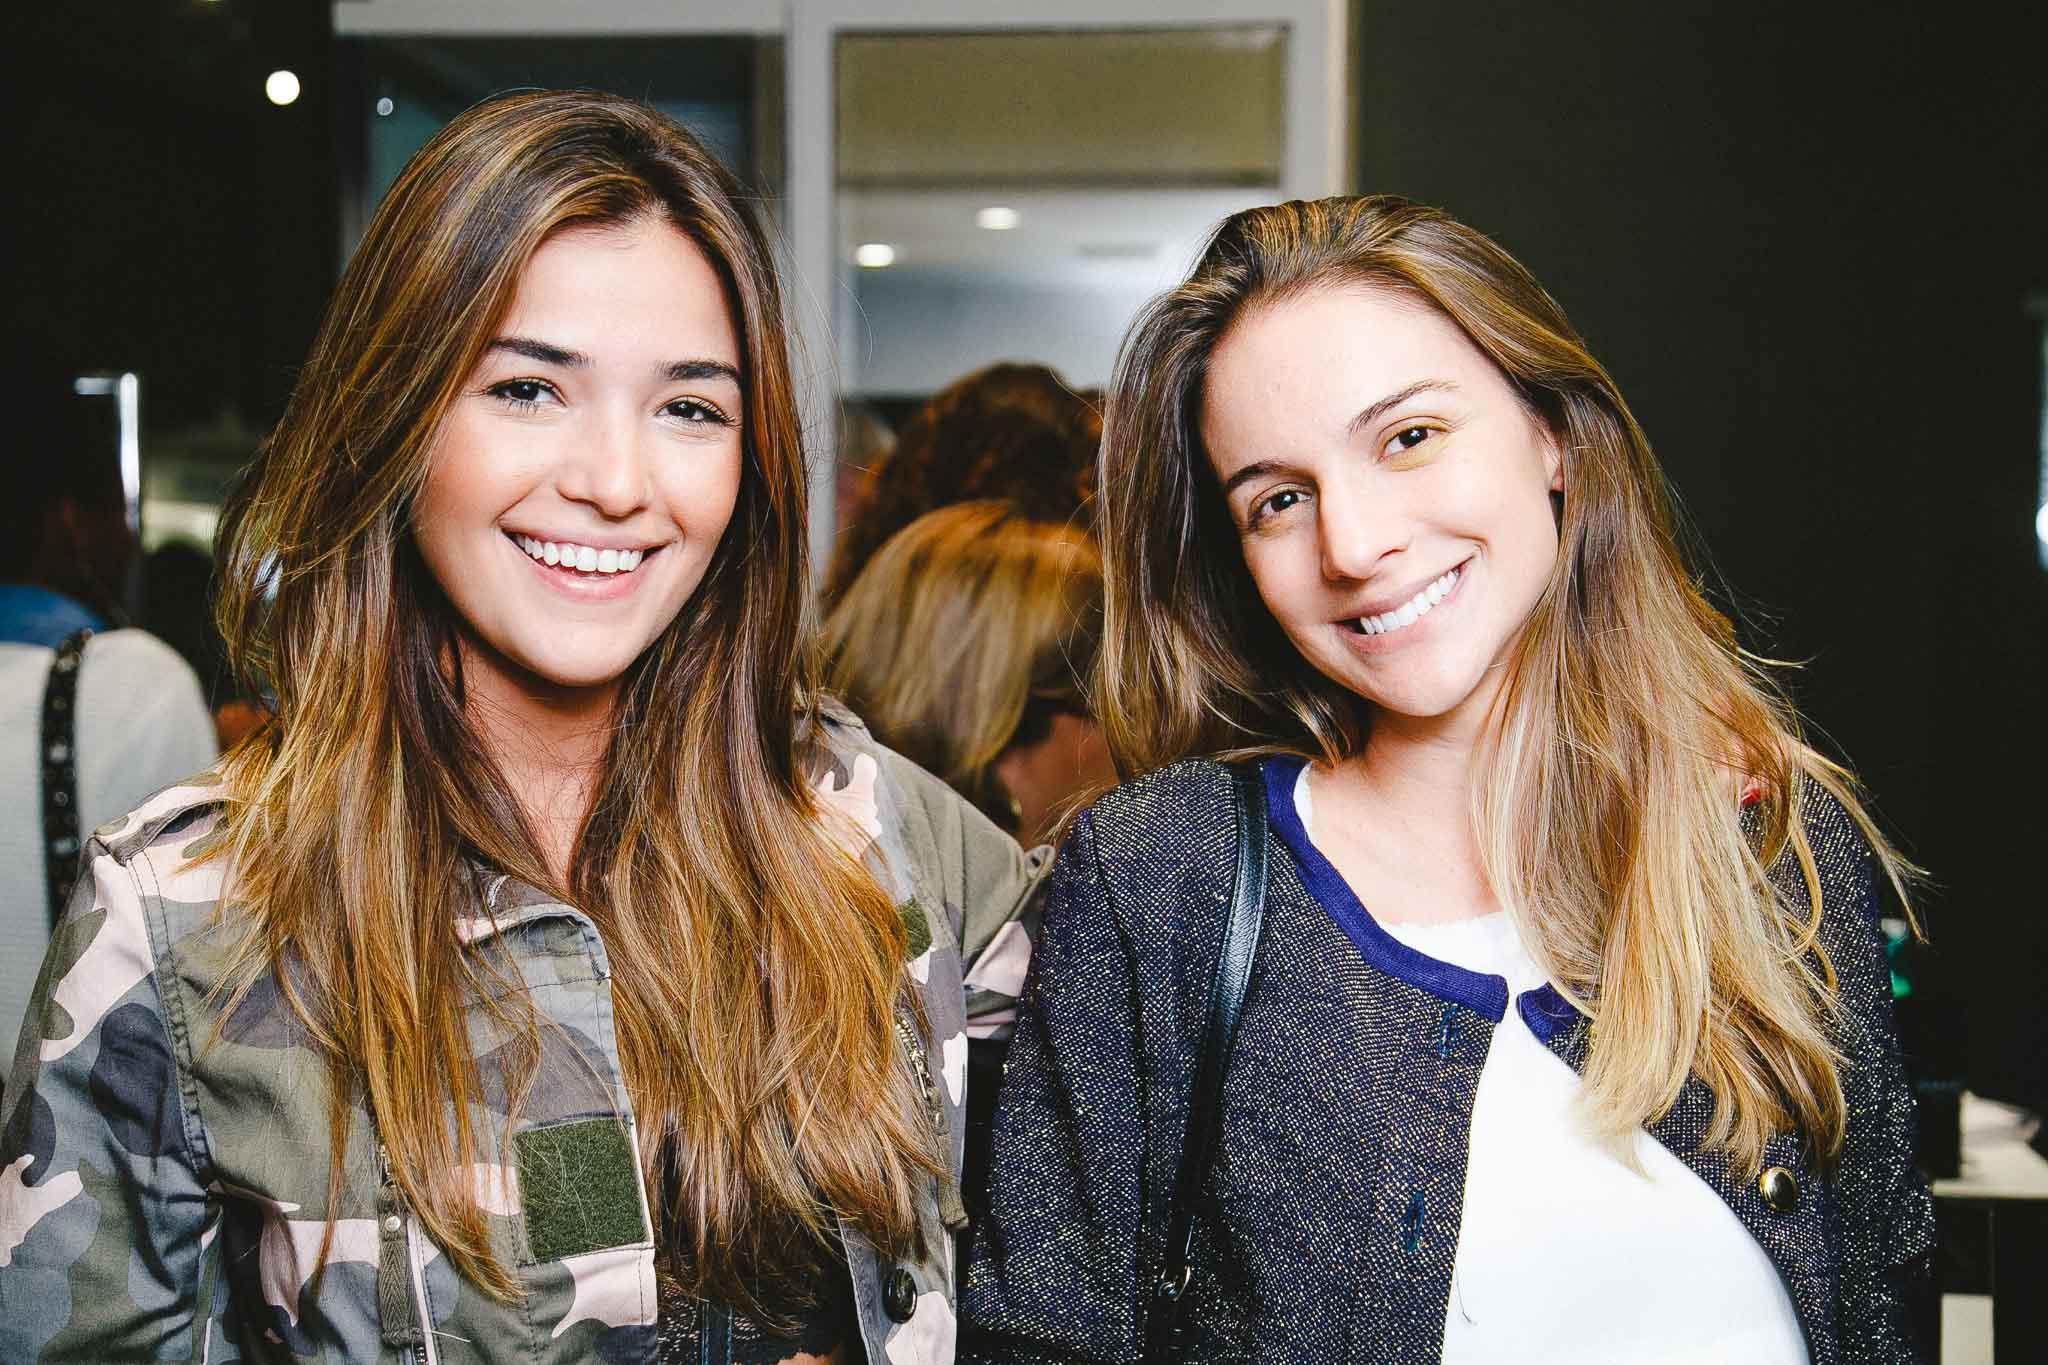 Mirella Manso e Ana Manuela Barcelos